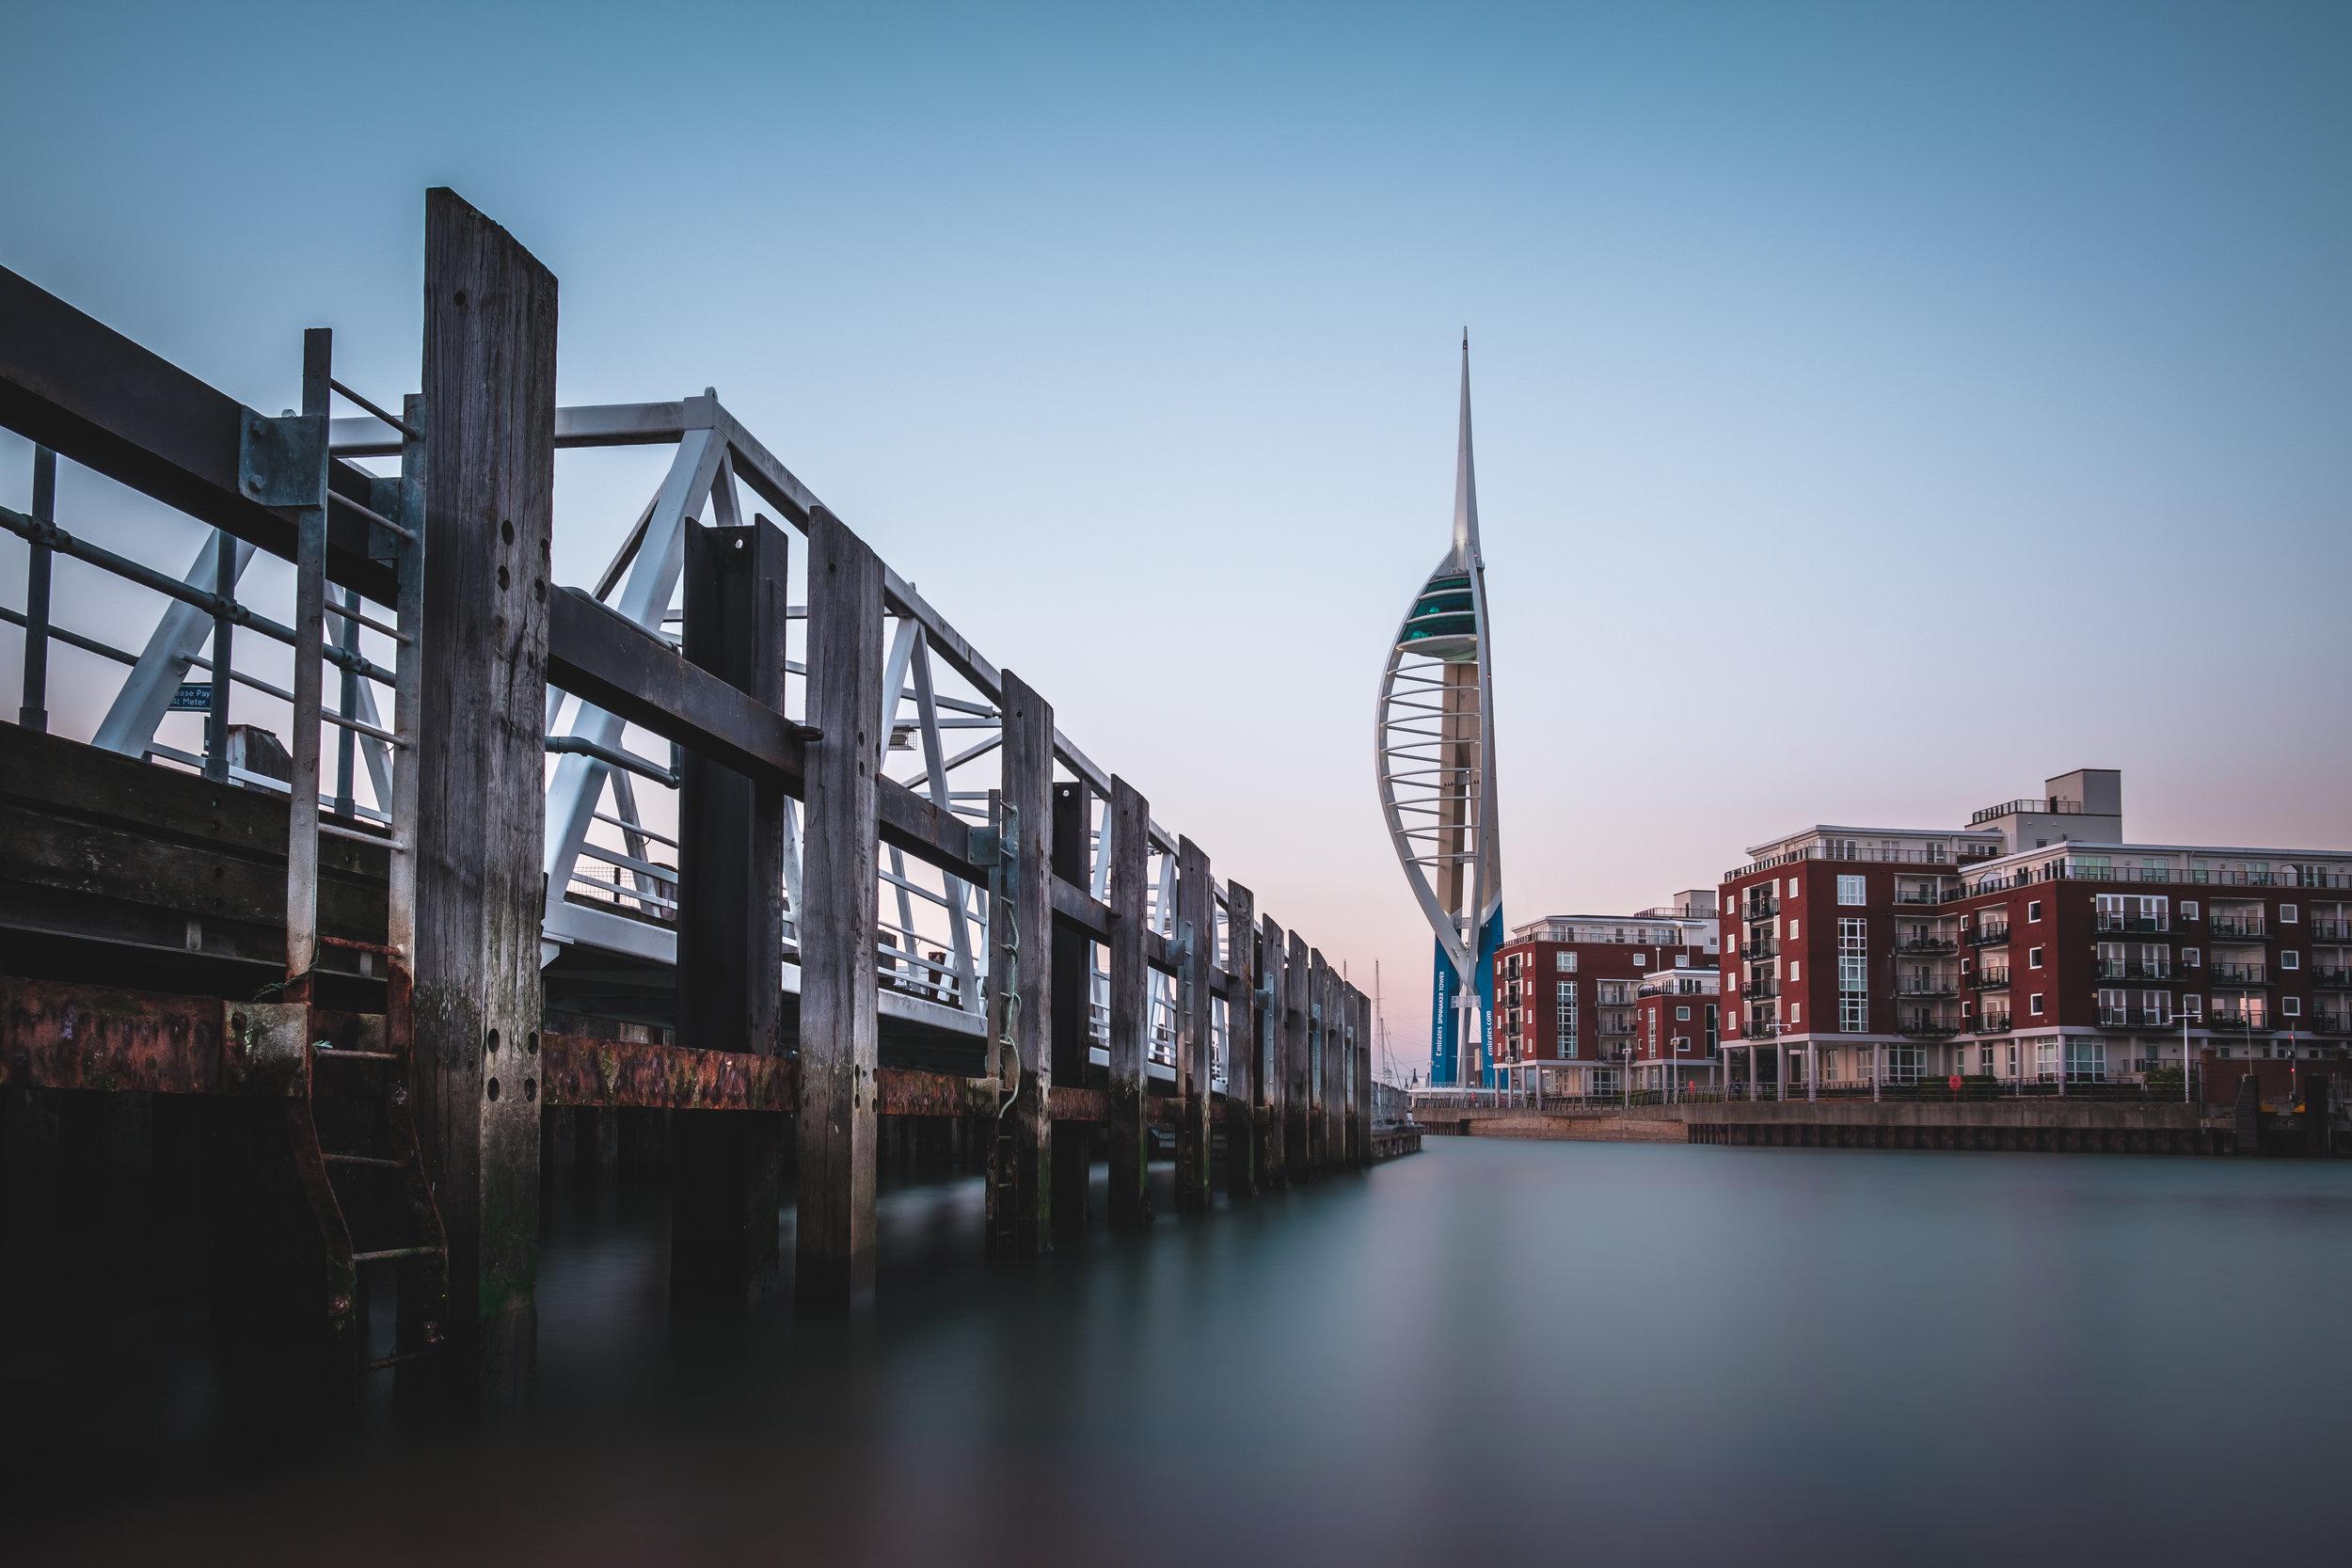 The Spinnaker Tower - Portsmouth, UK